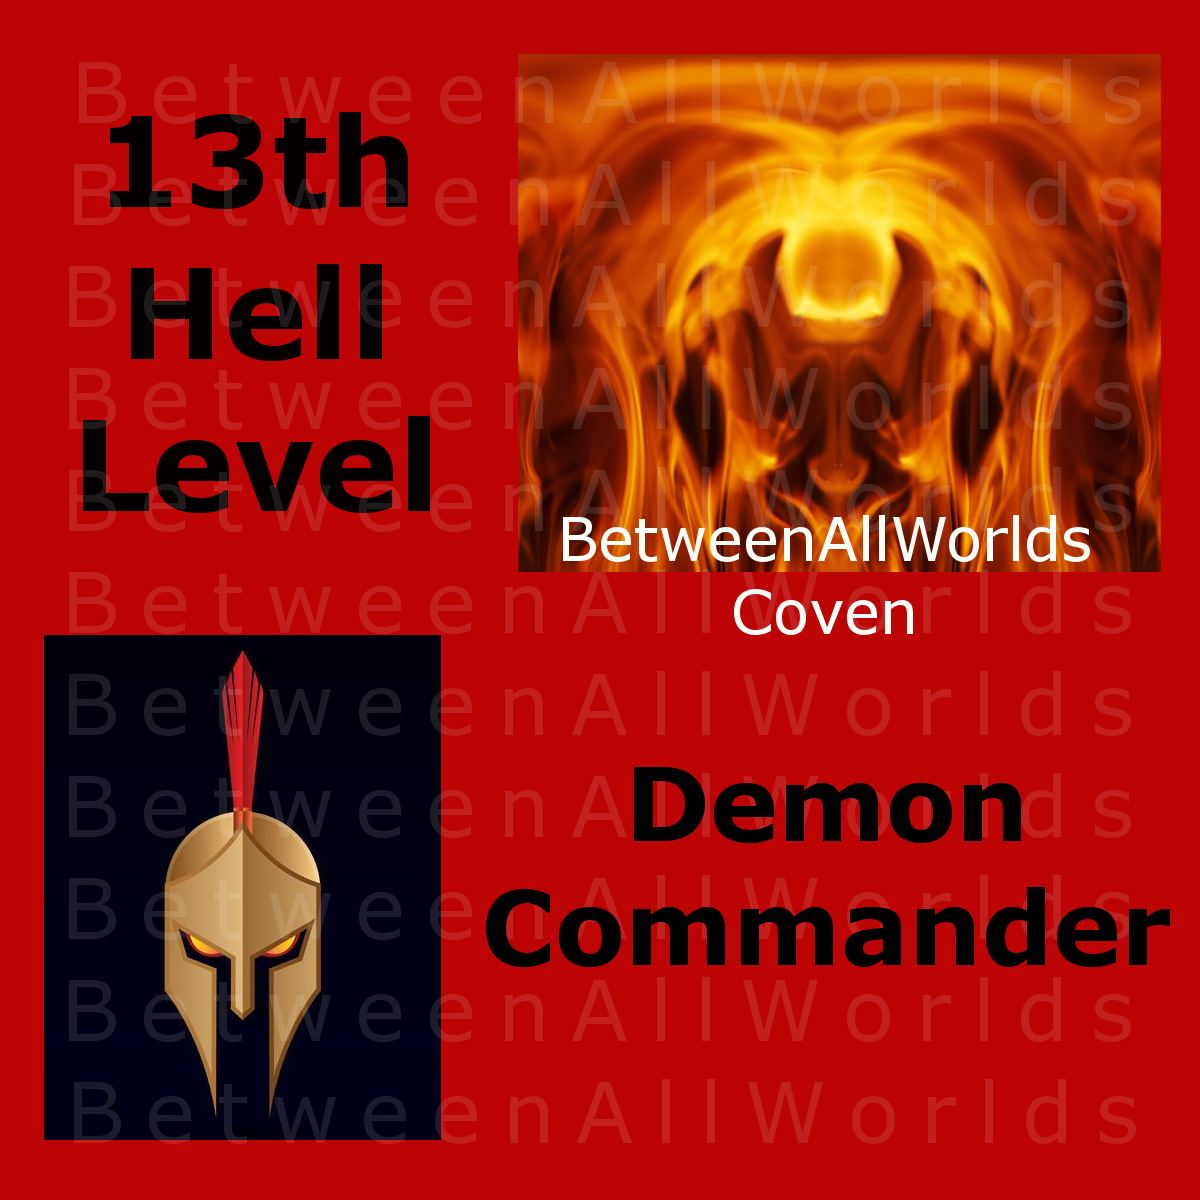 jmk spr Rare Demon Commander From Hell & His Dark Demon Army Betweenallworlds   - $159.00